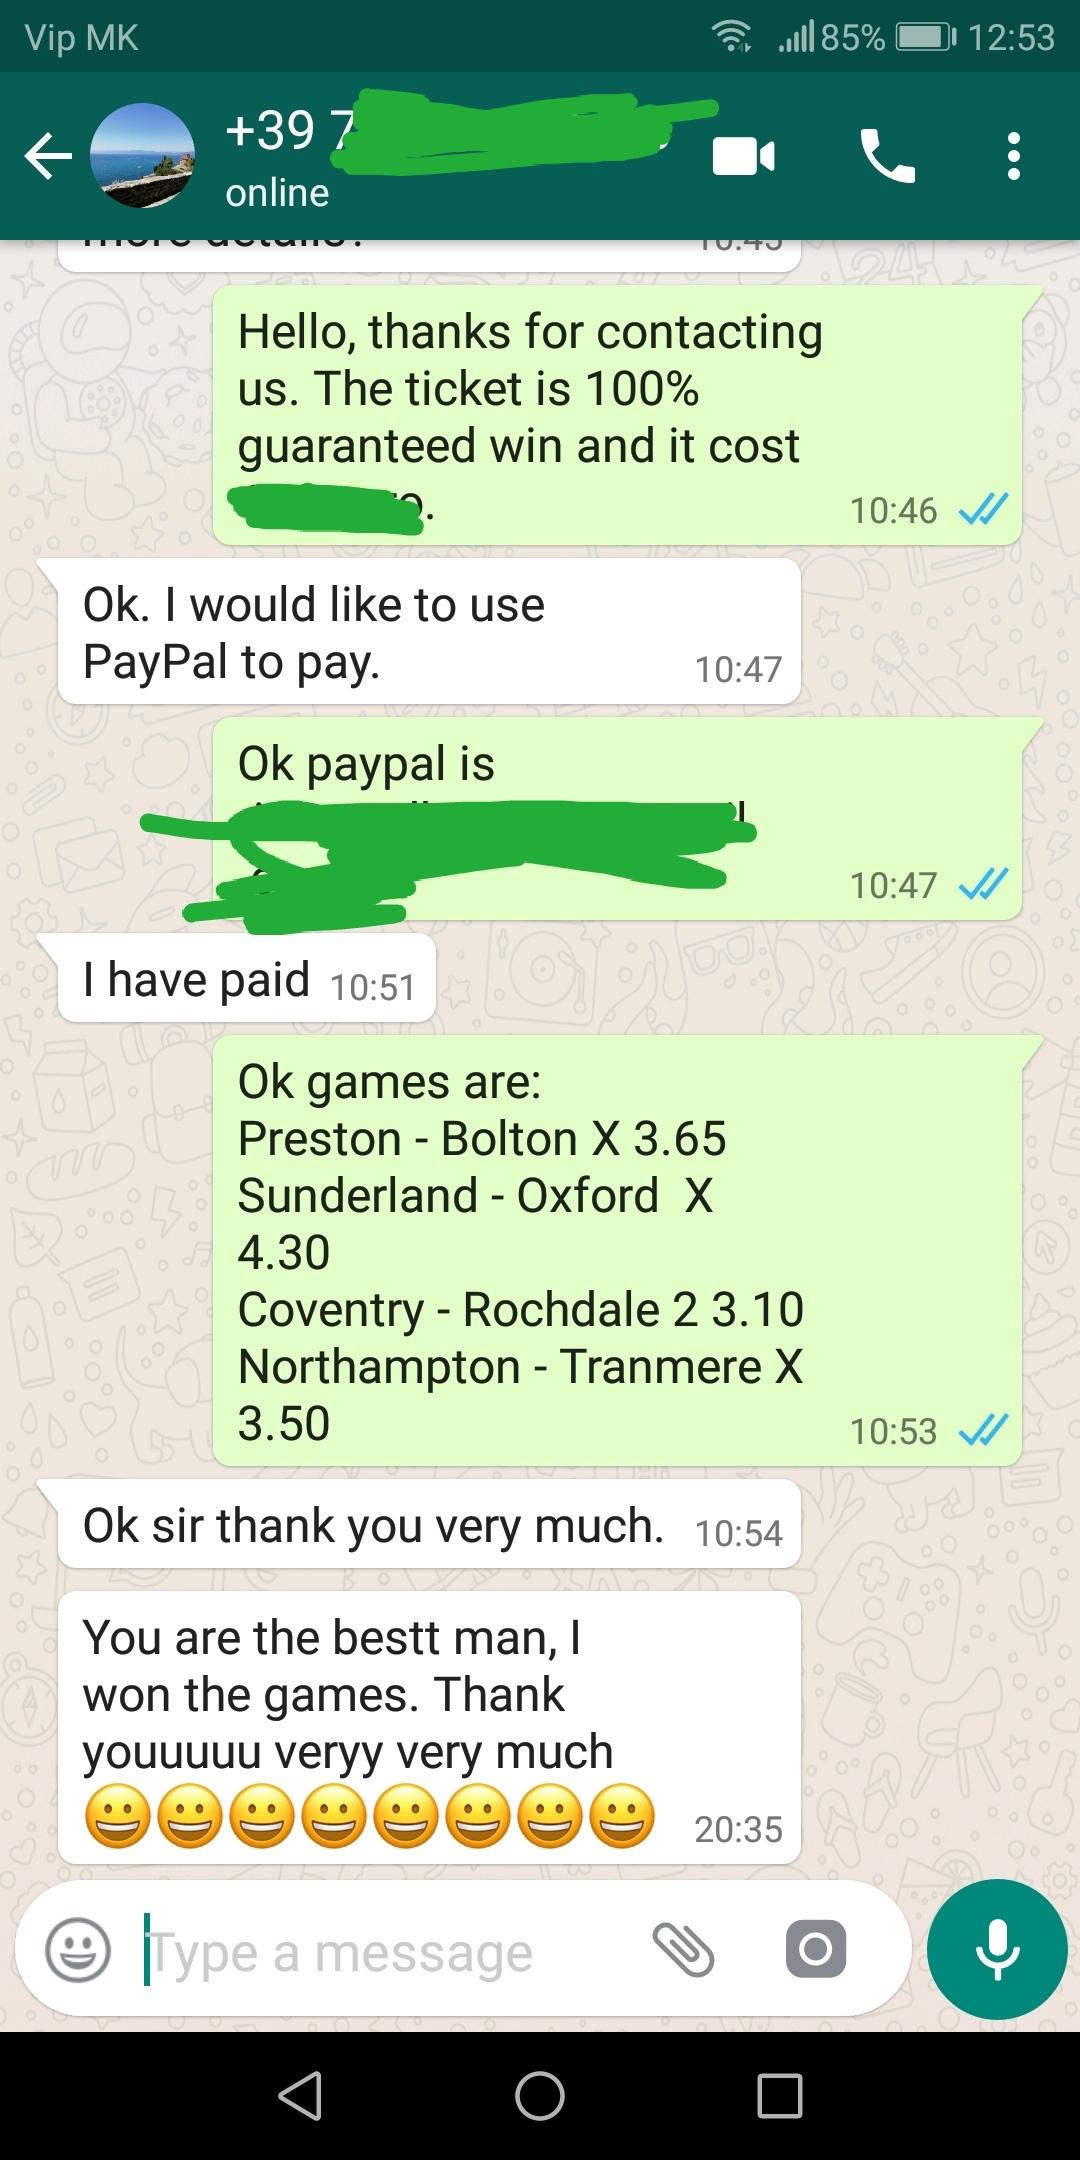 WhatsApp proof 01 09 2018